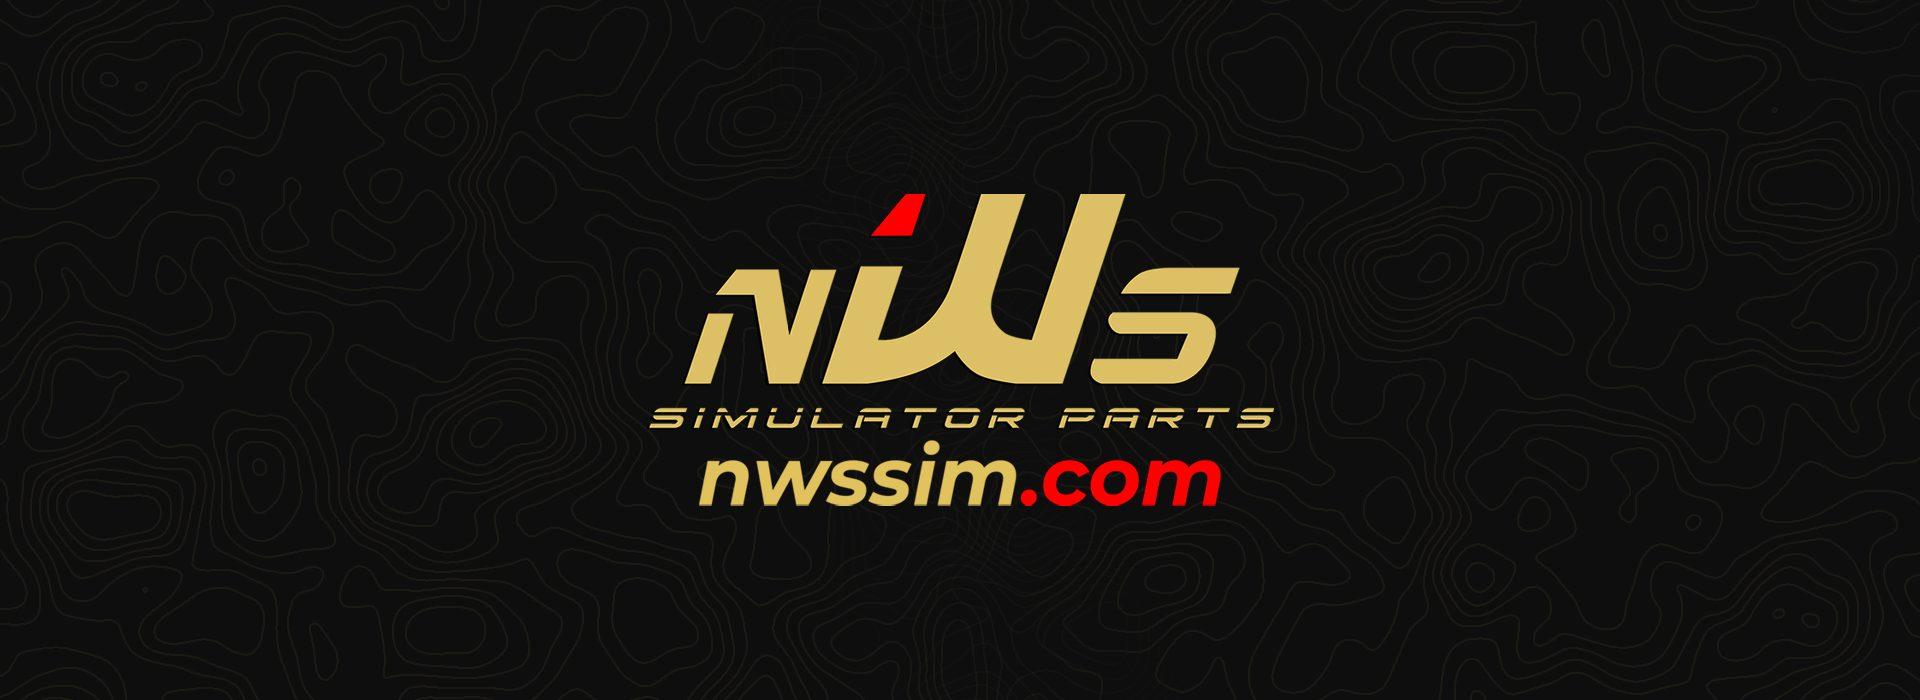 new web banner